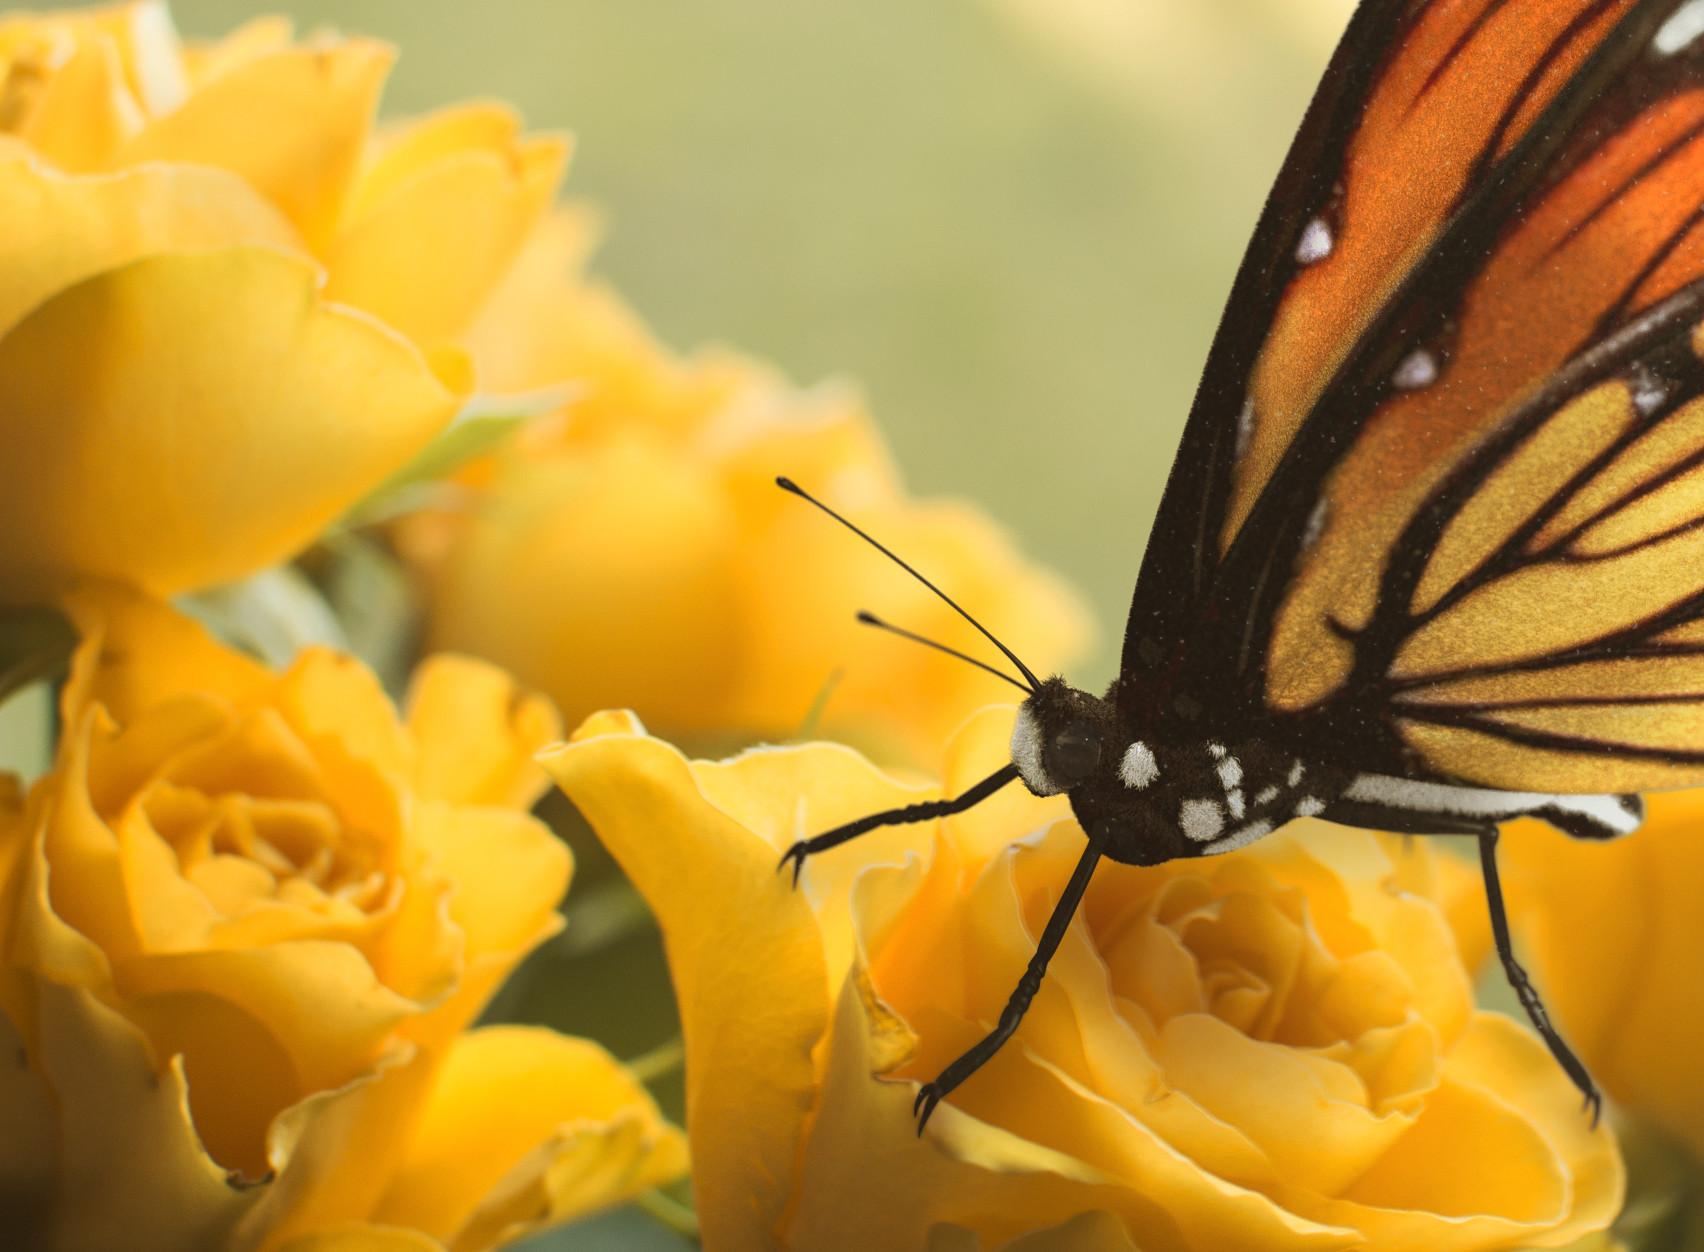 Krzysztof gryzka butterfly 02